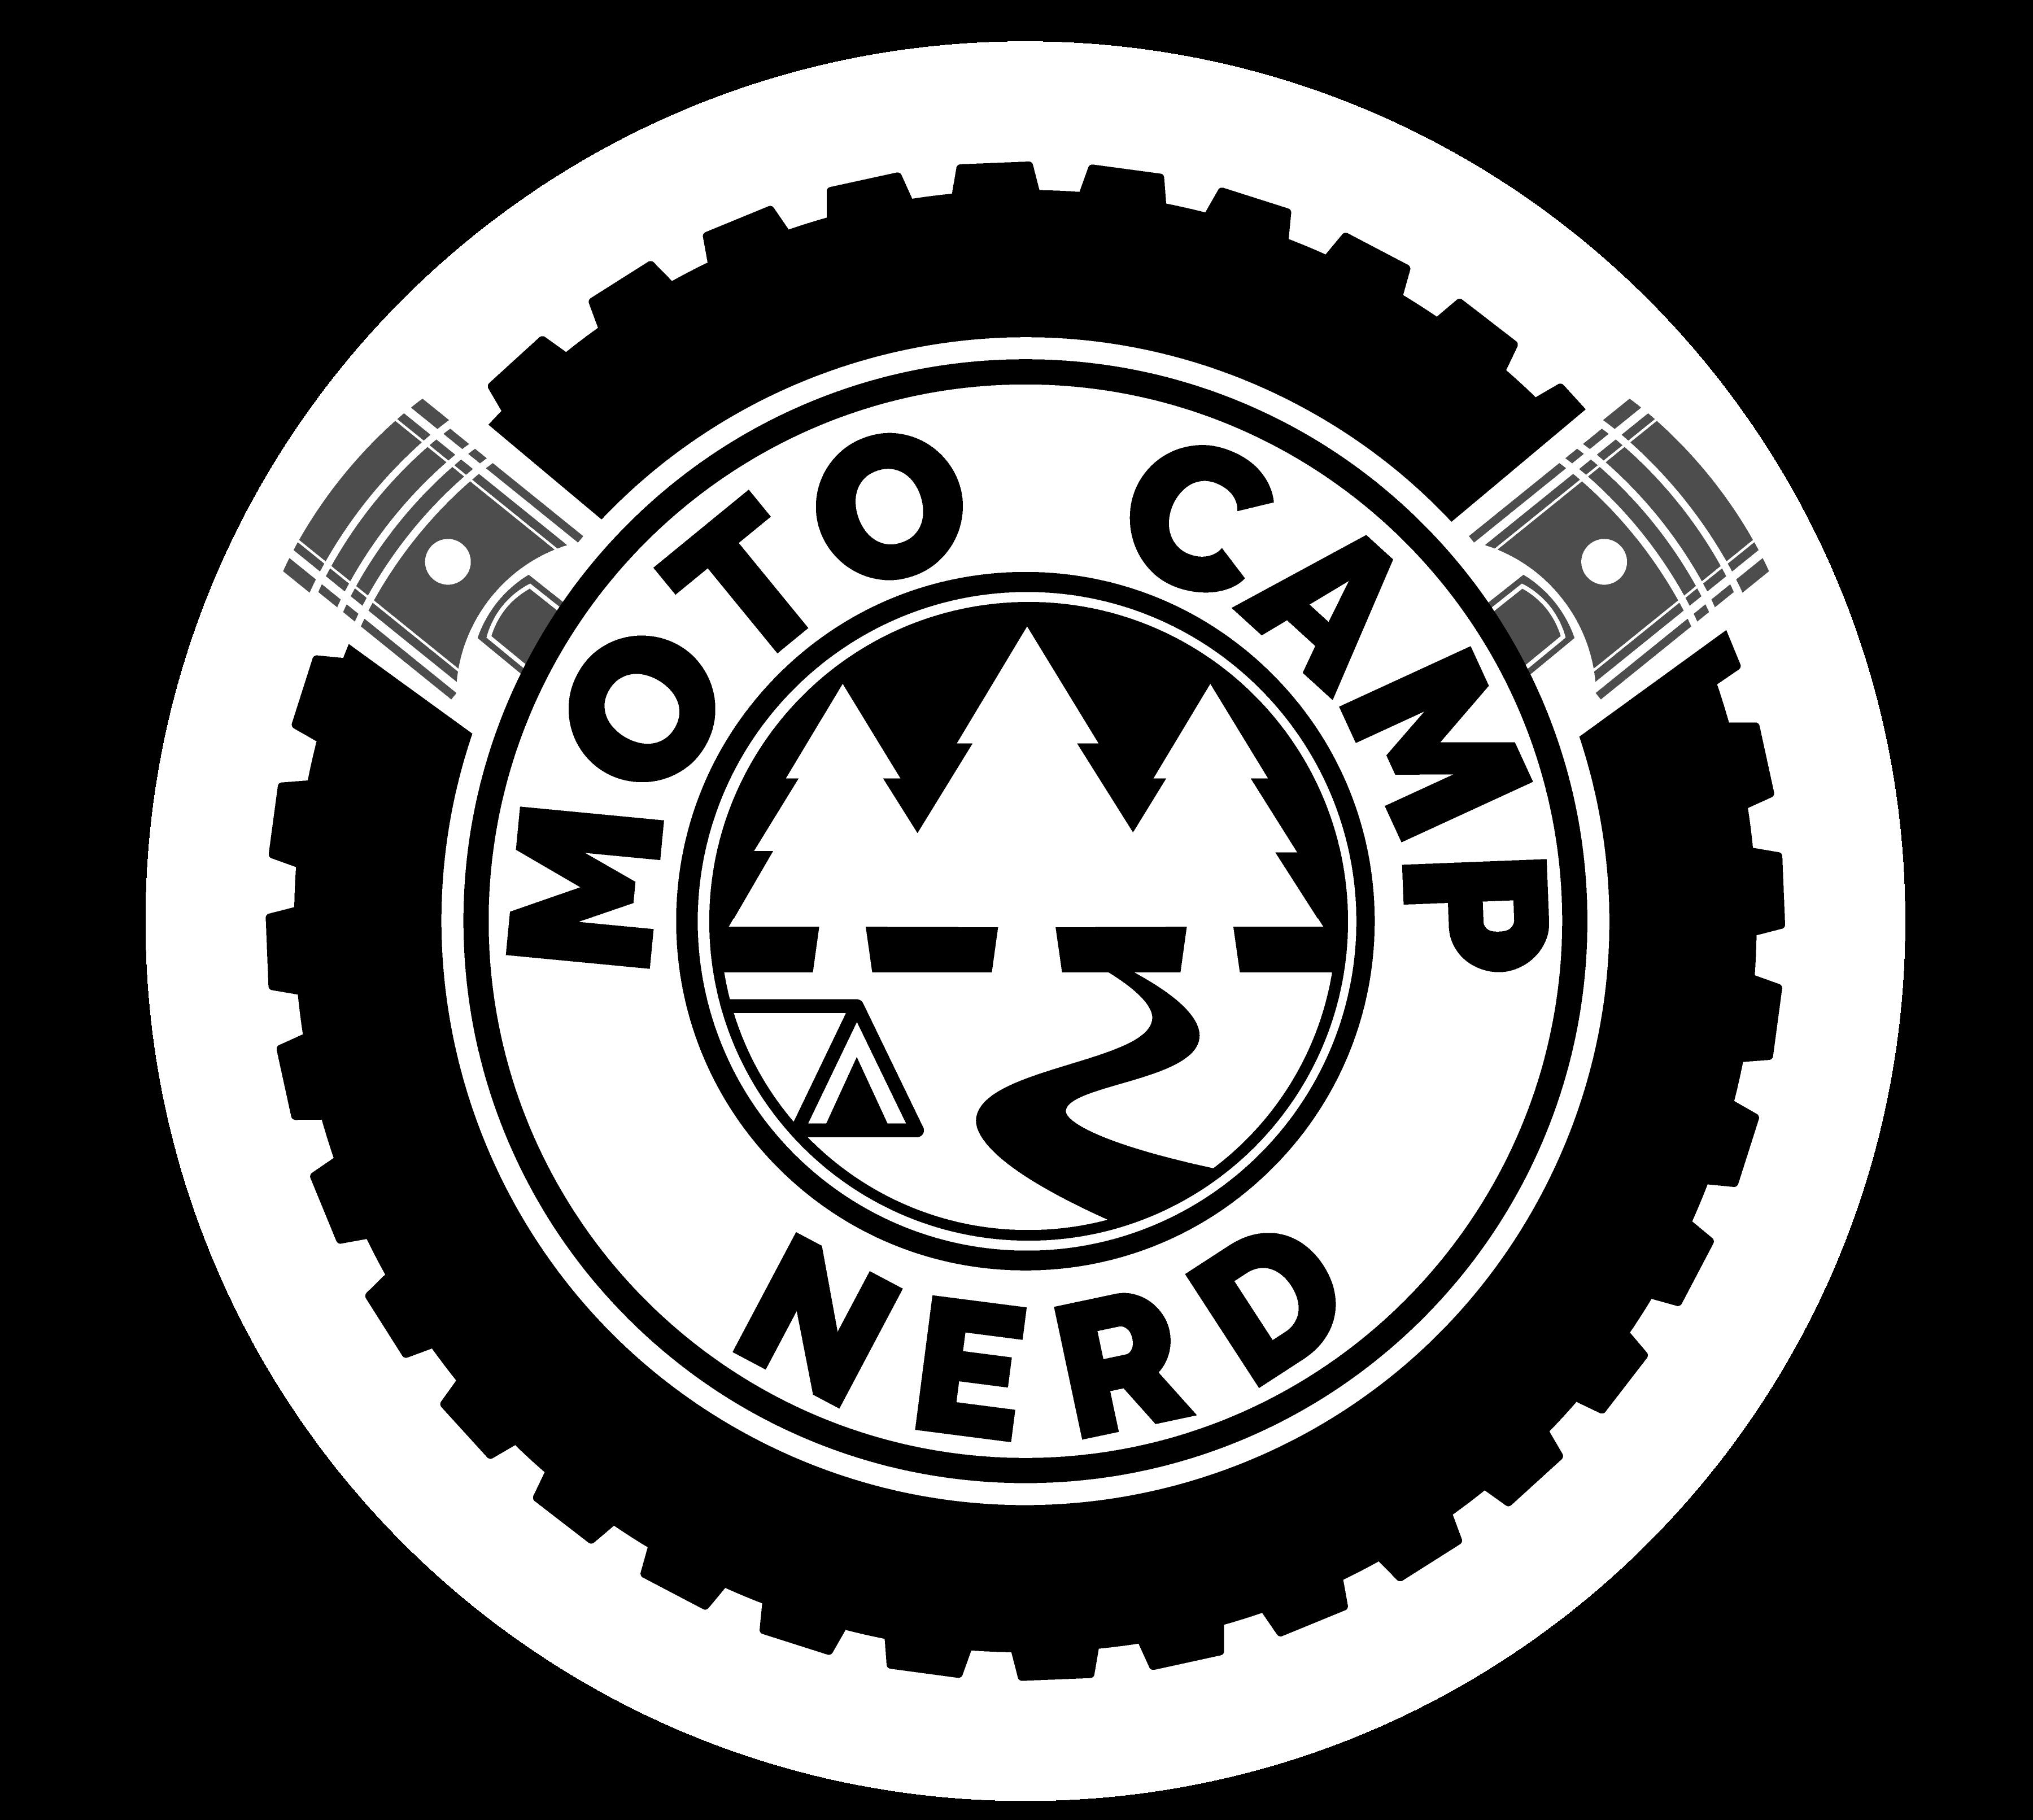 What is Moto Camp Nerd?